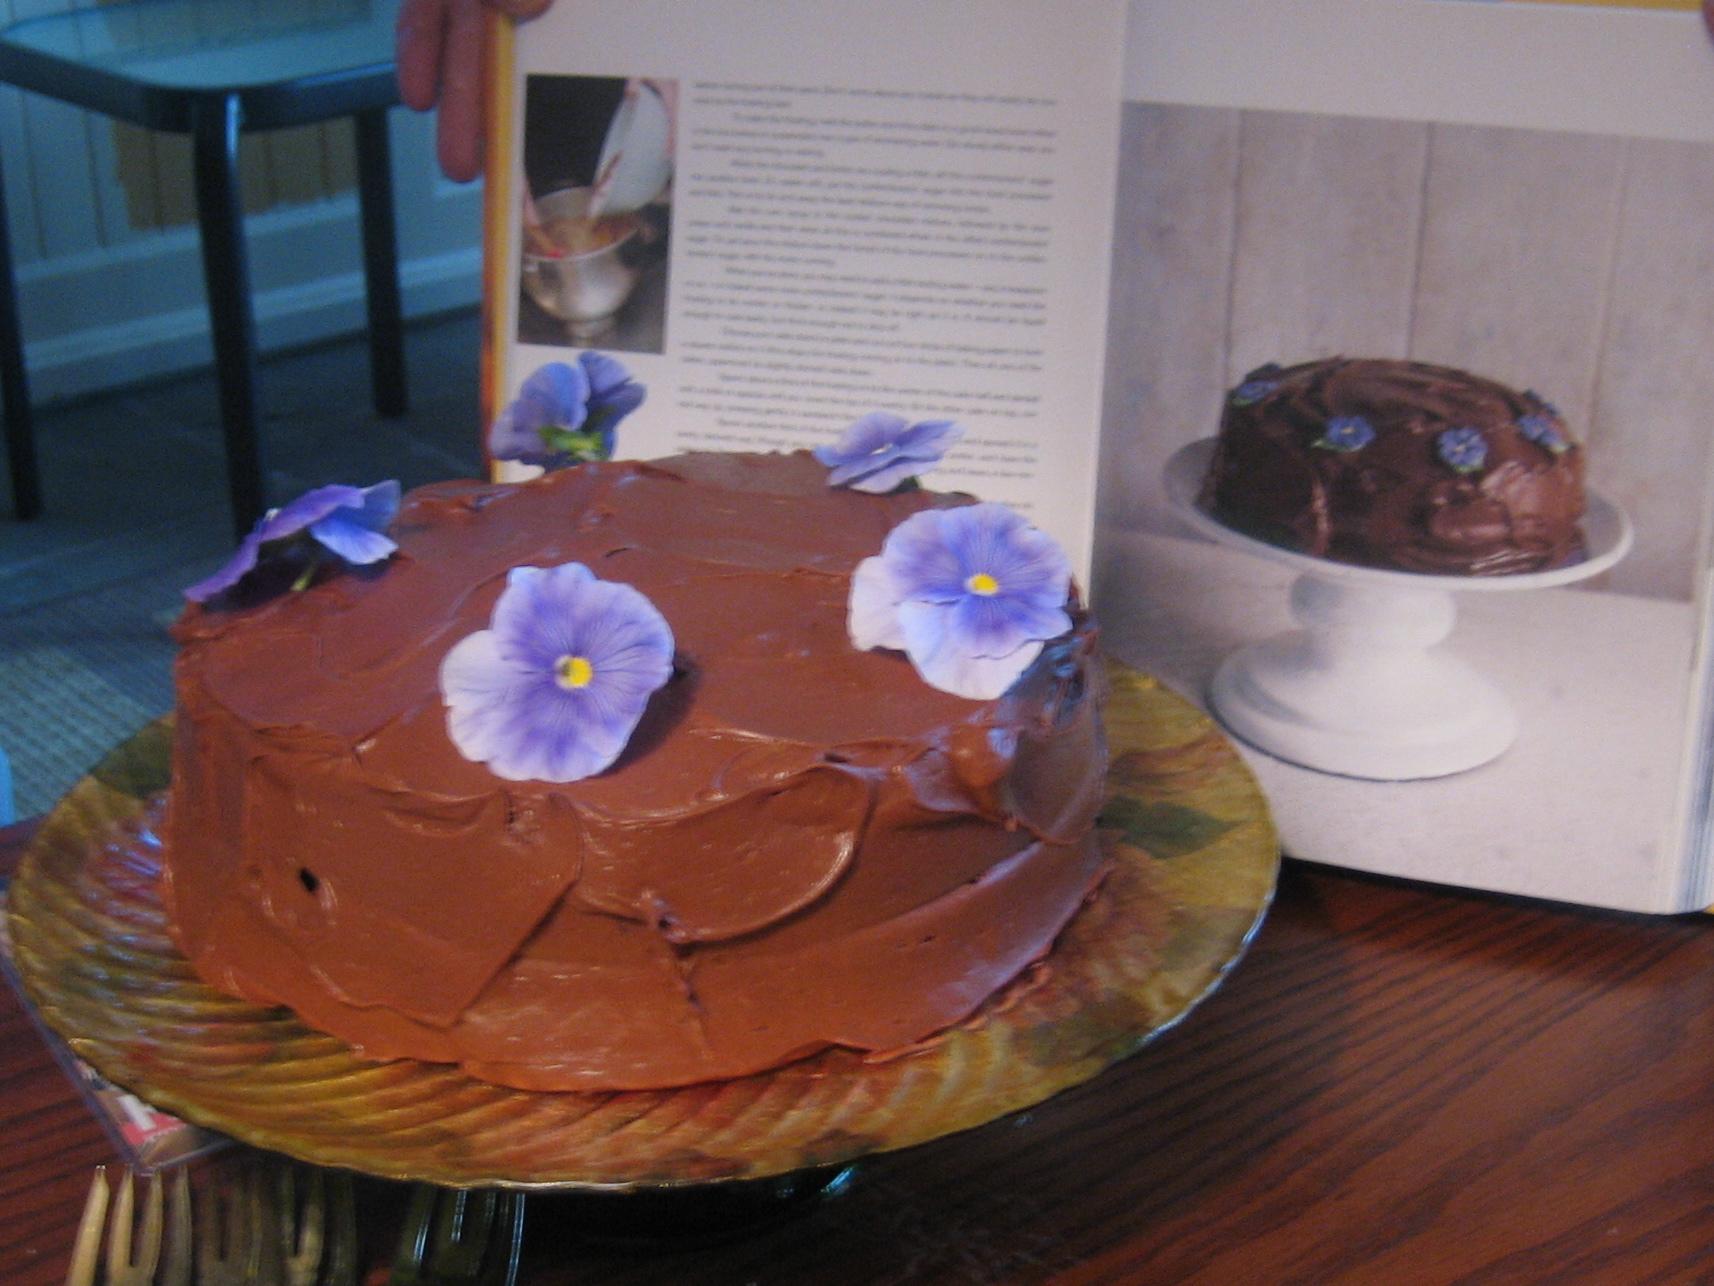 Old-Fashioned Coconut Cake Recipe at Epicurious.com